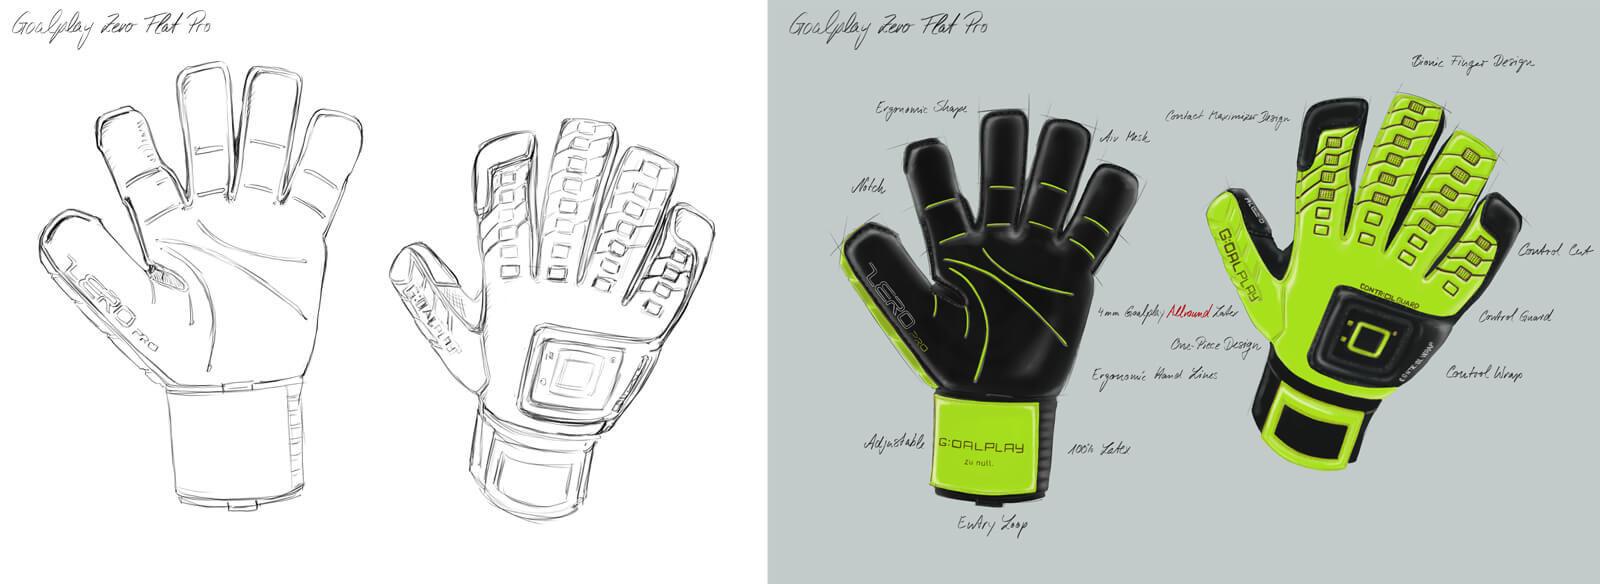 goodbye-adidas-oliver-kahn-launches-goalkeeper-brand-design